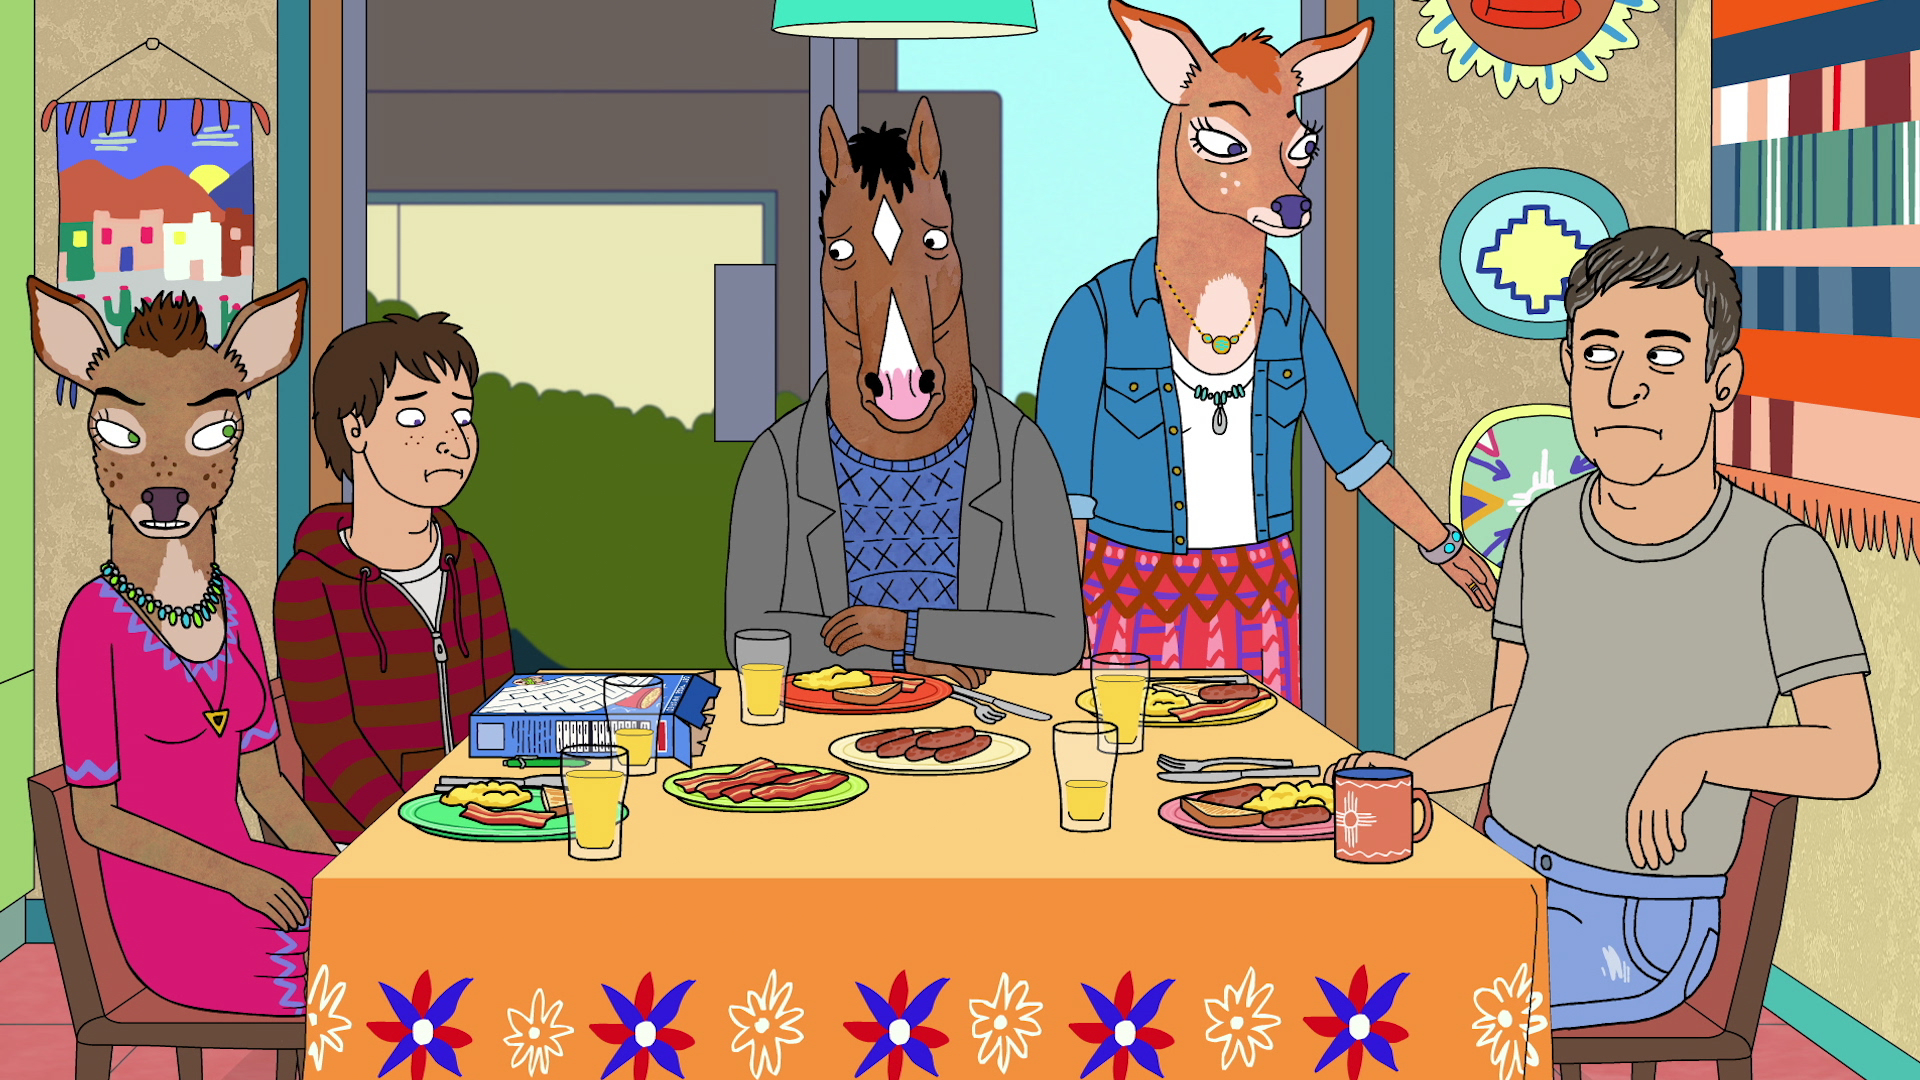 BoJack Horseman Season 2